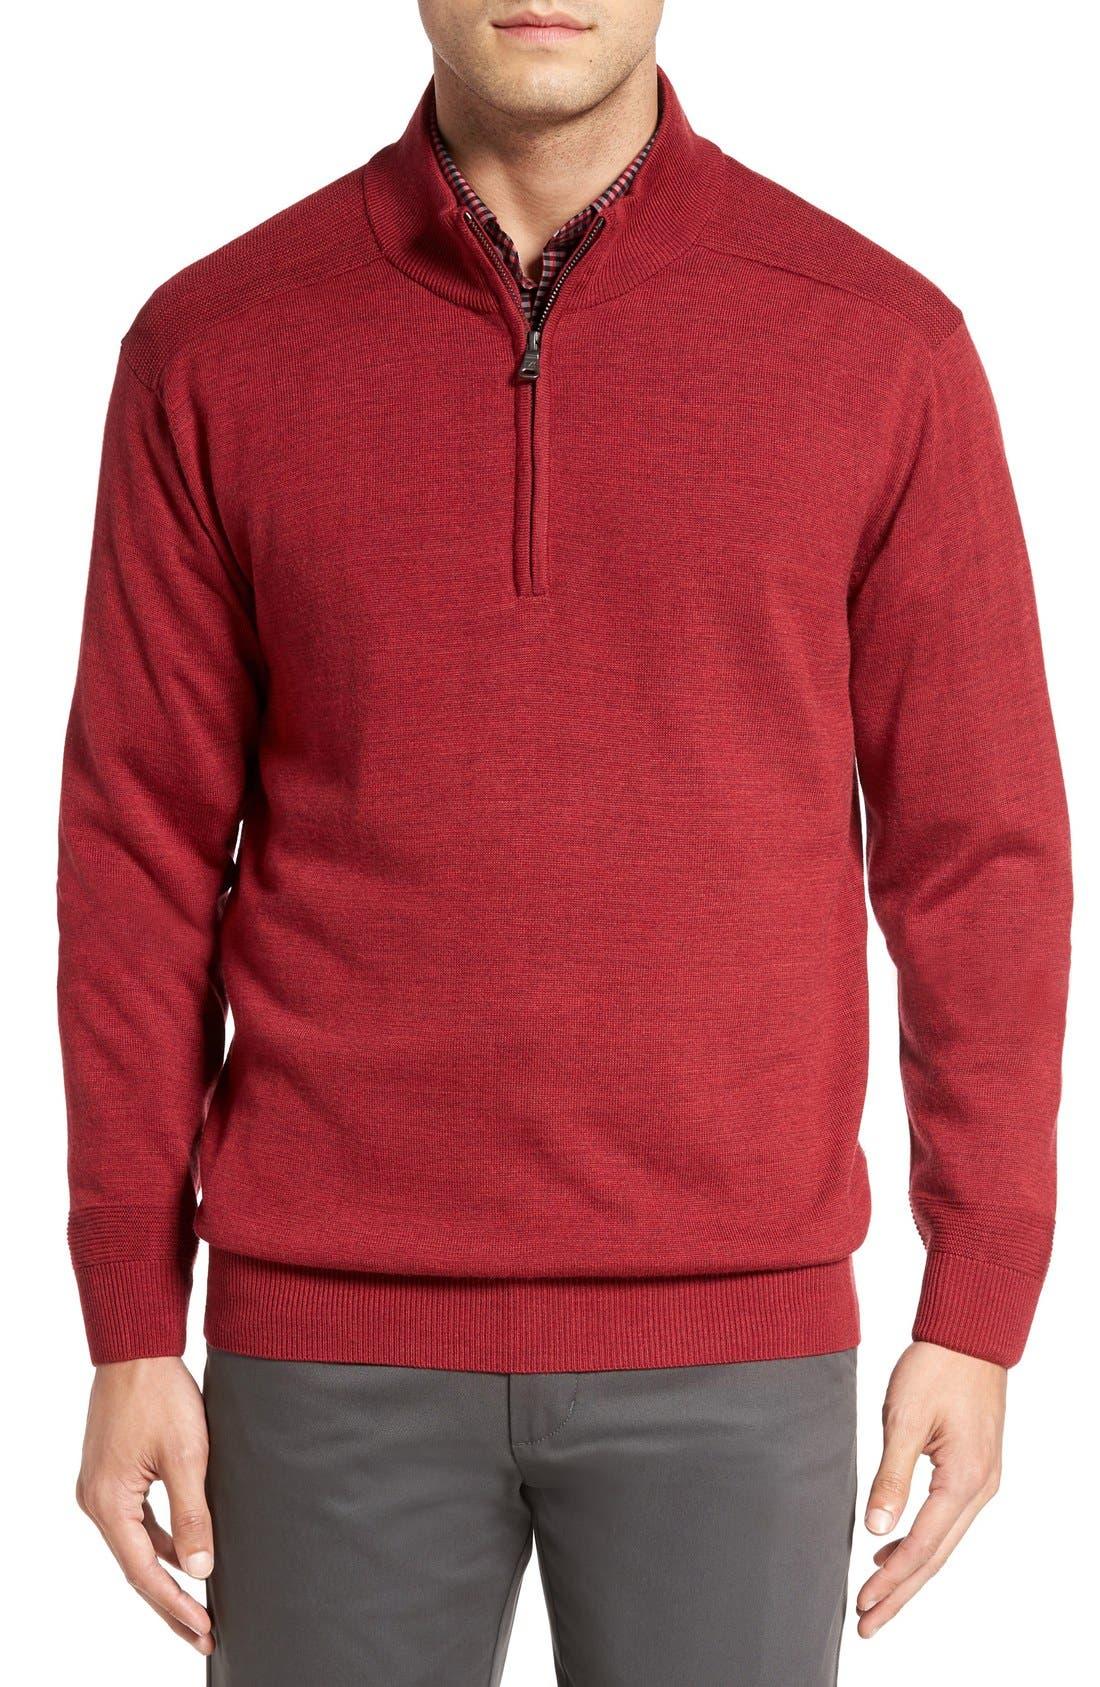 Douglas Quarter Zip Wool Blend Sweater,                             Main thumbnail 6, color,